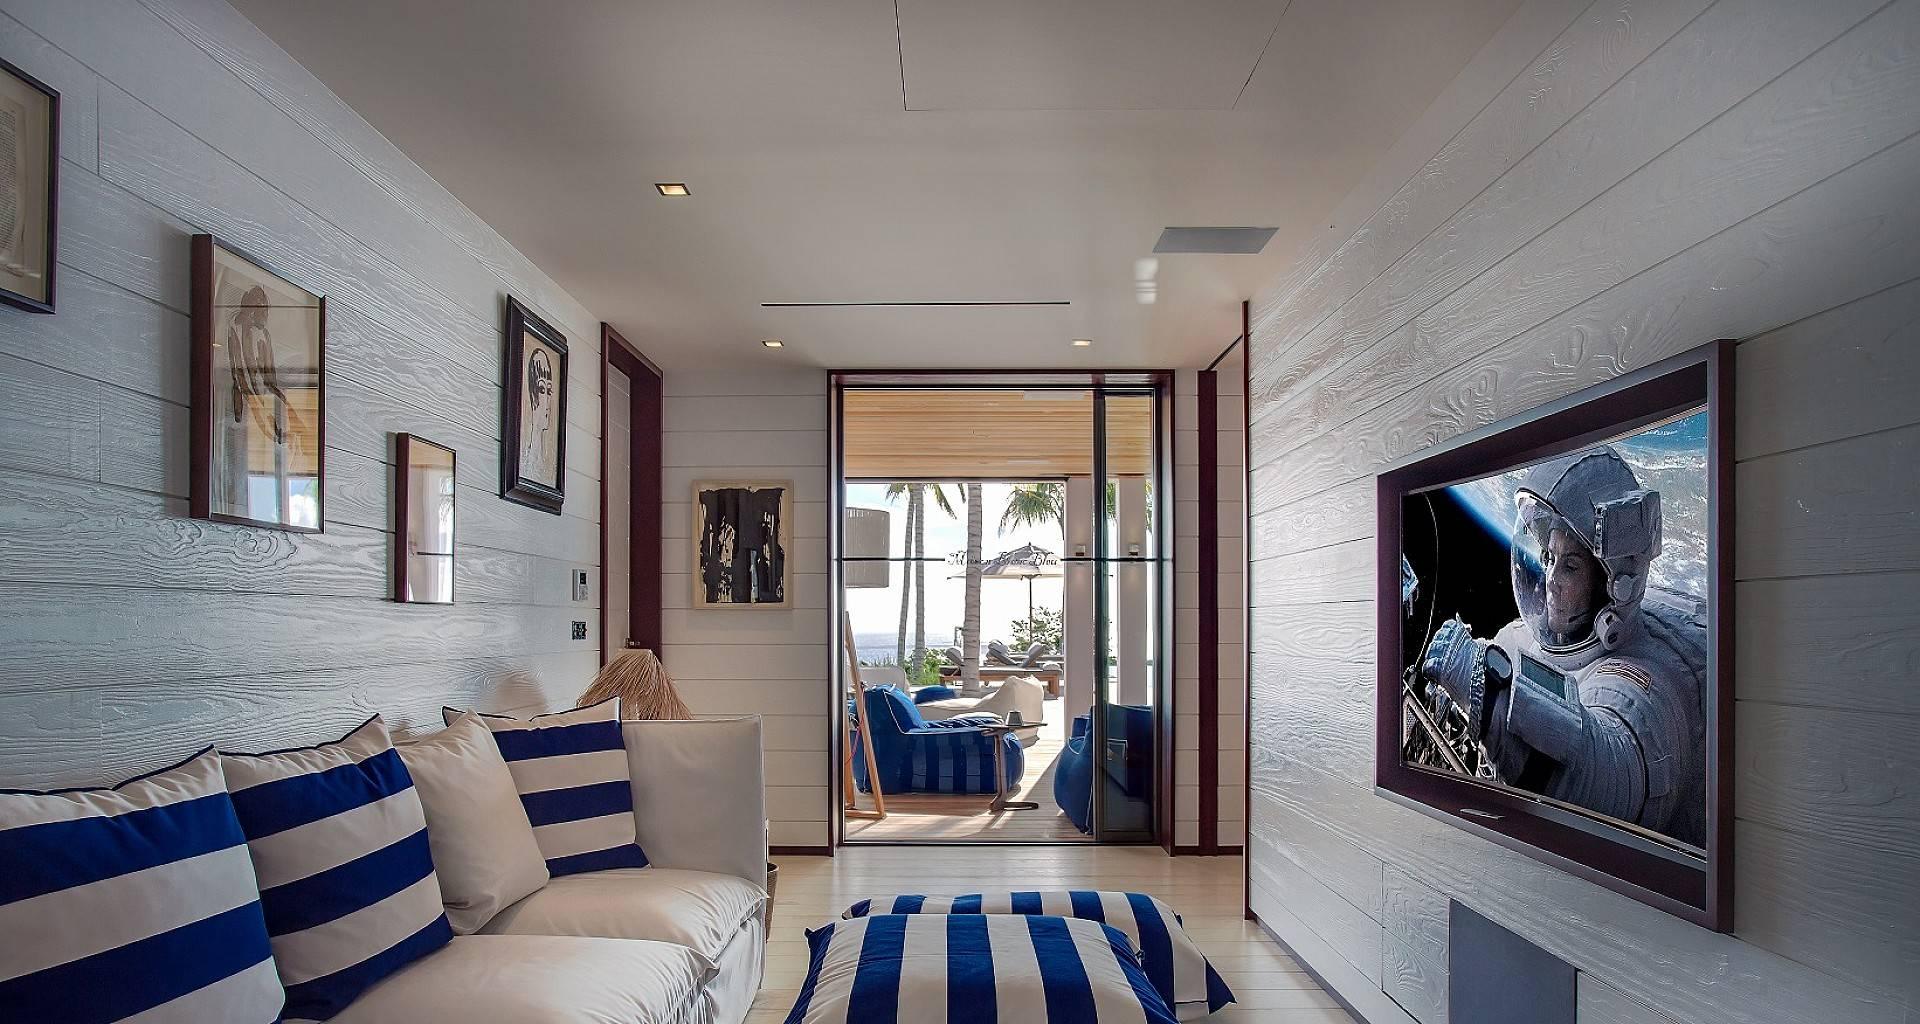 Villa Maison Blanc Bleu TV Room